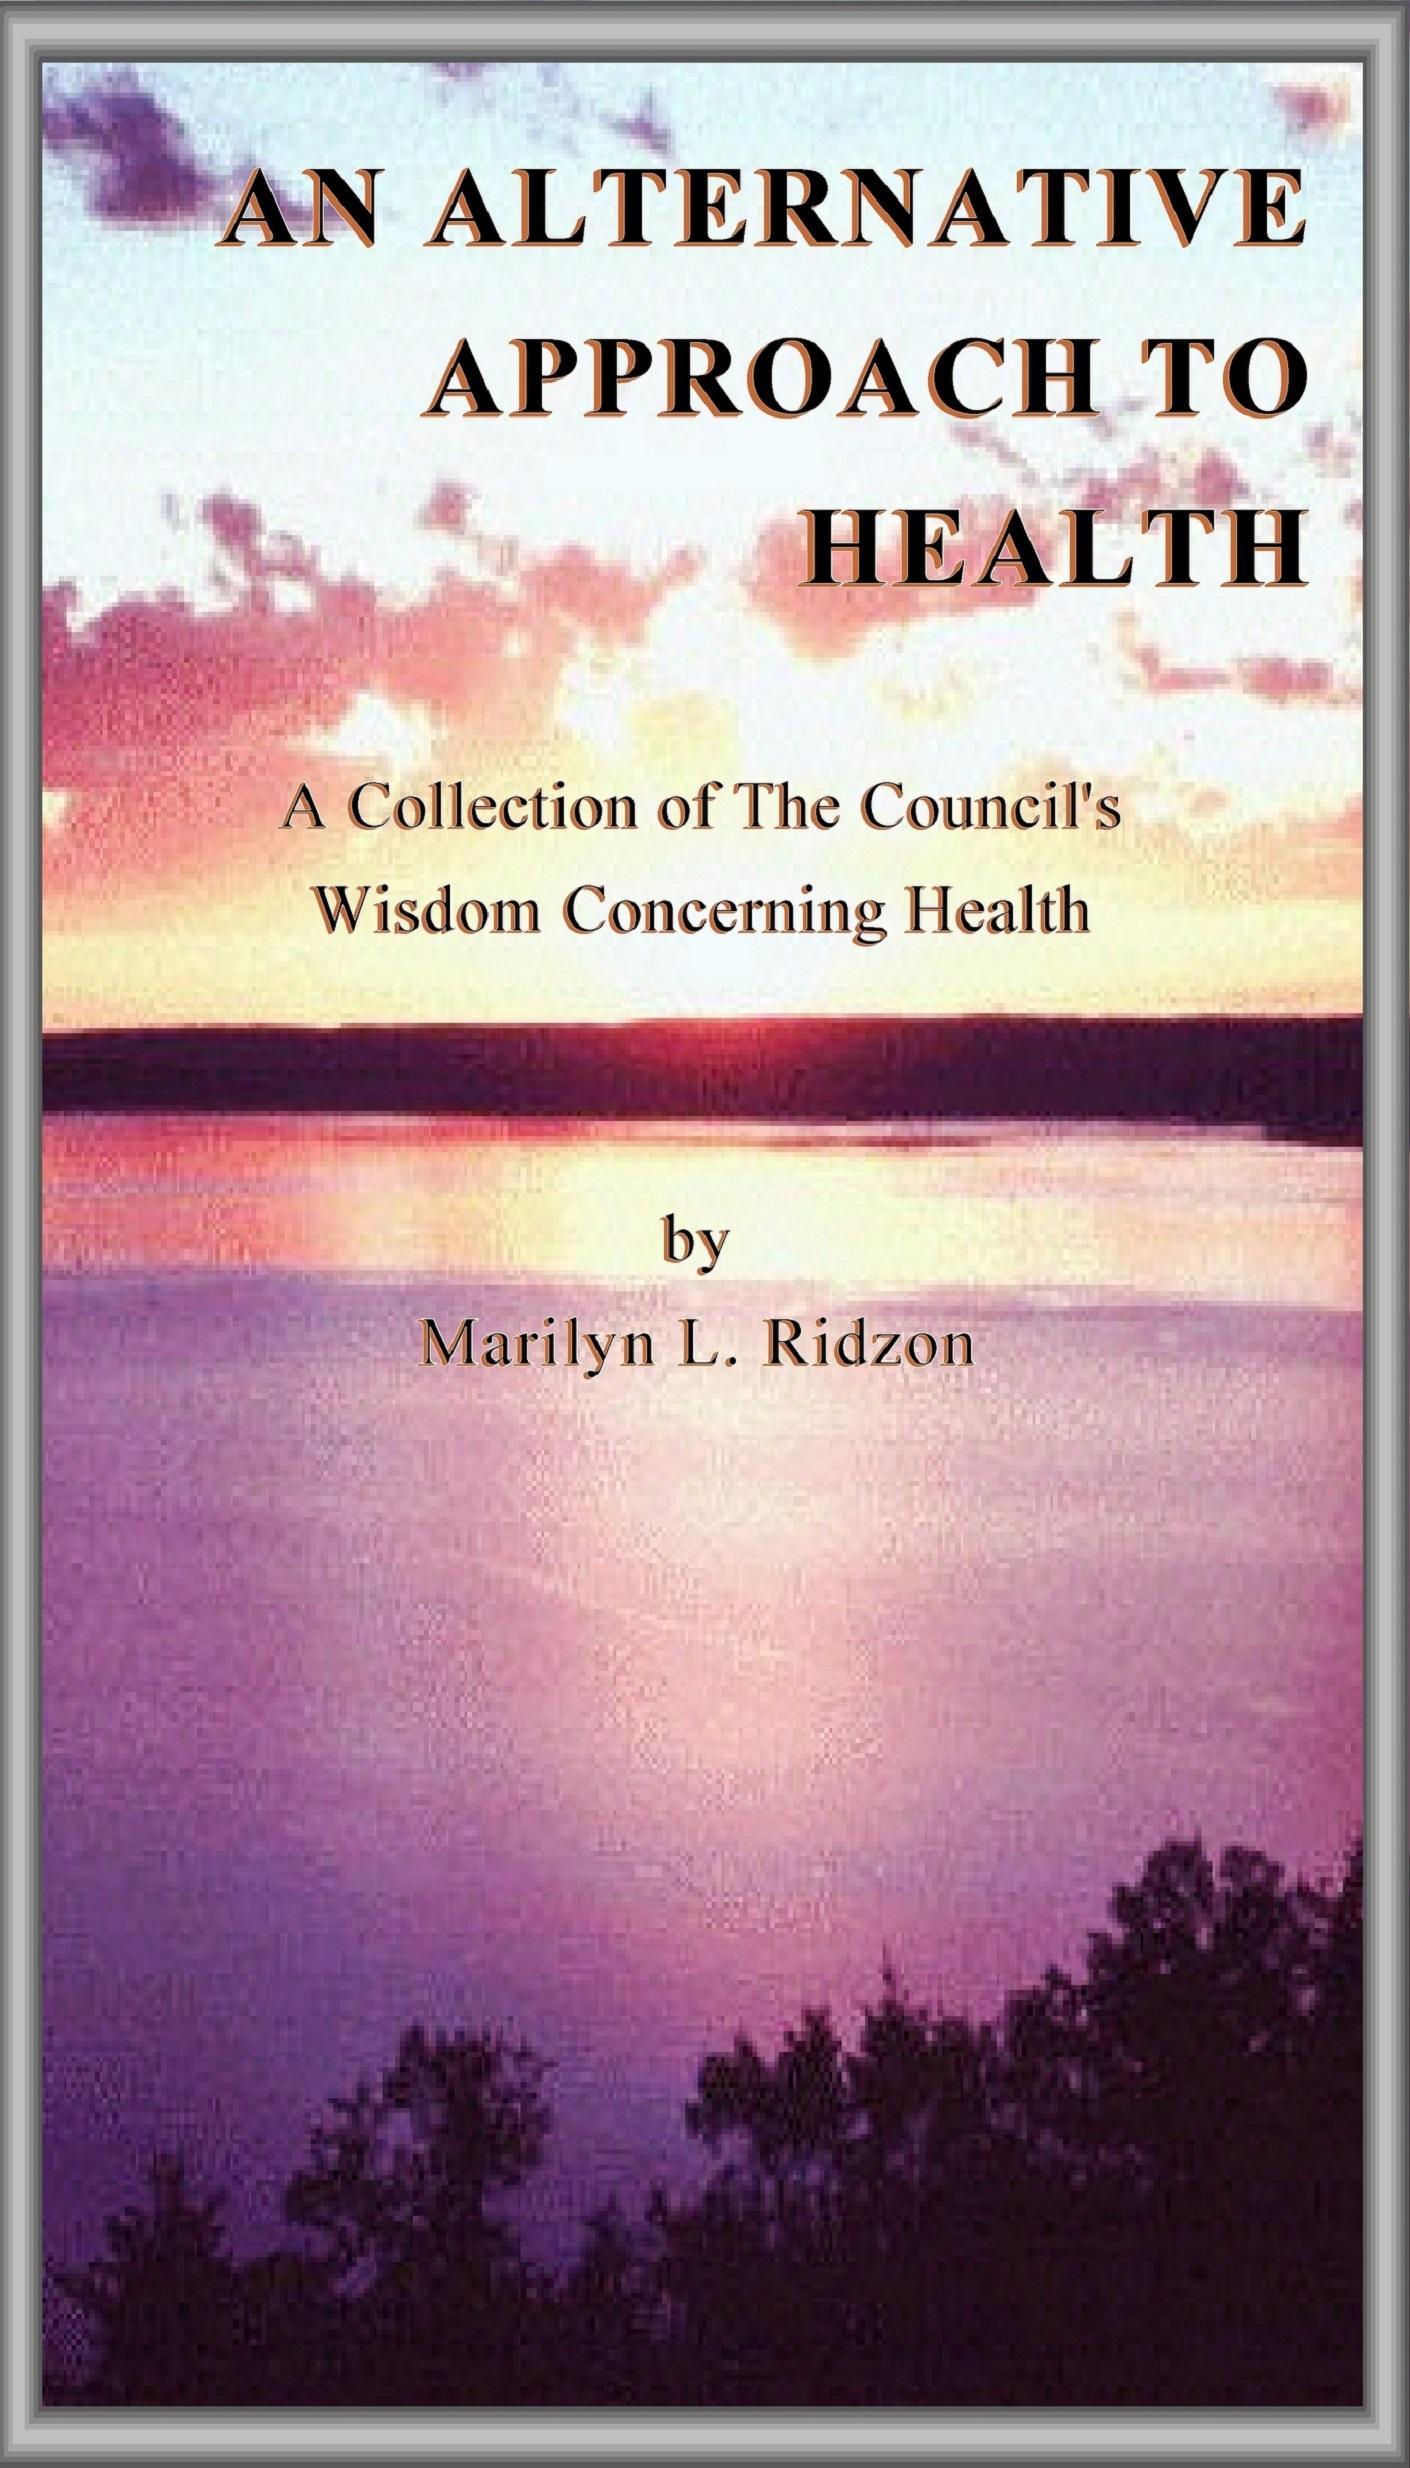 An Alternative Approach to Health